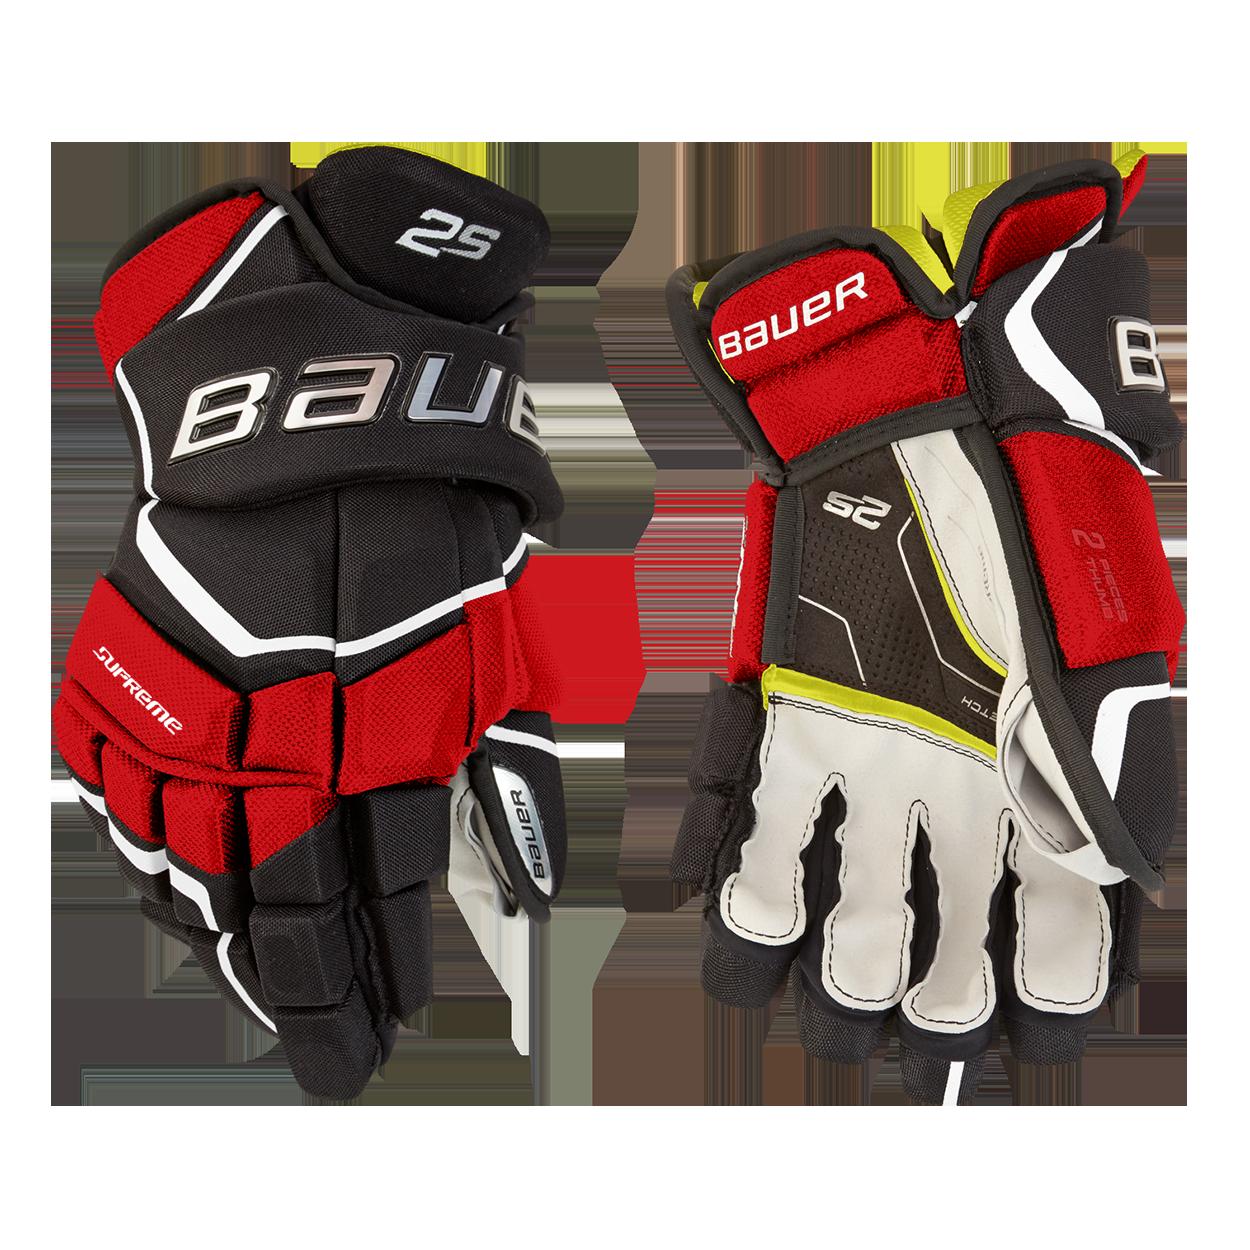 Hokejové rukavice Bauer Supreme 2S JR